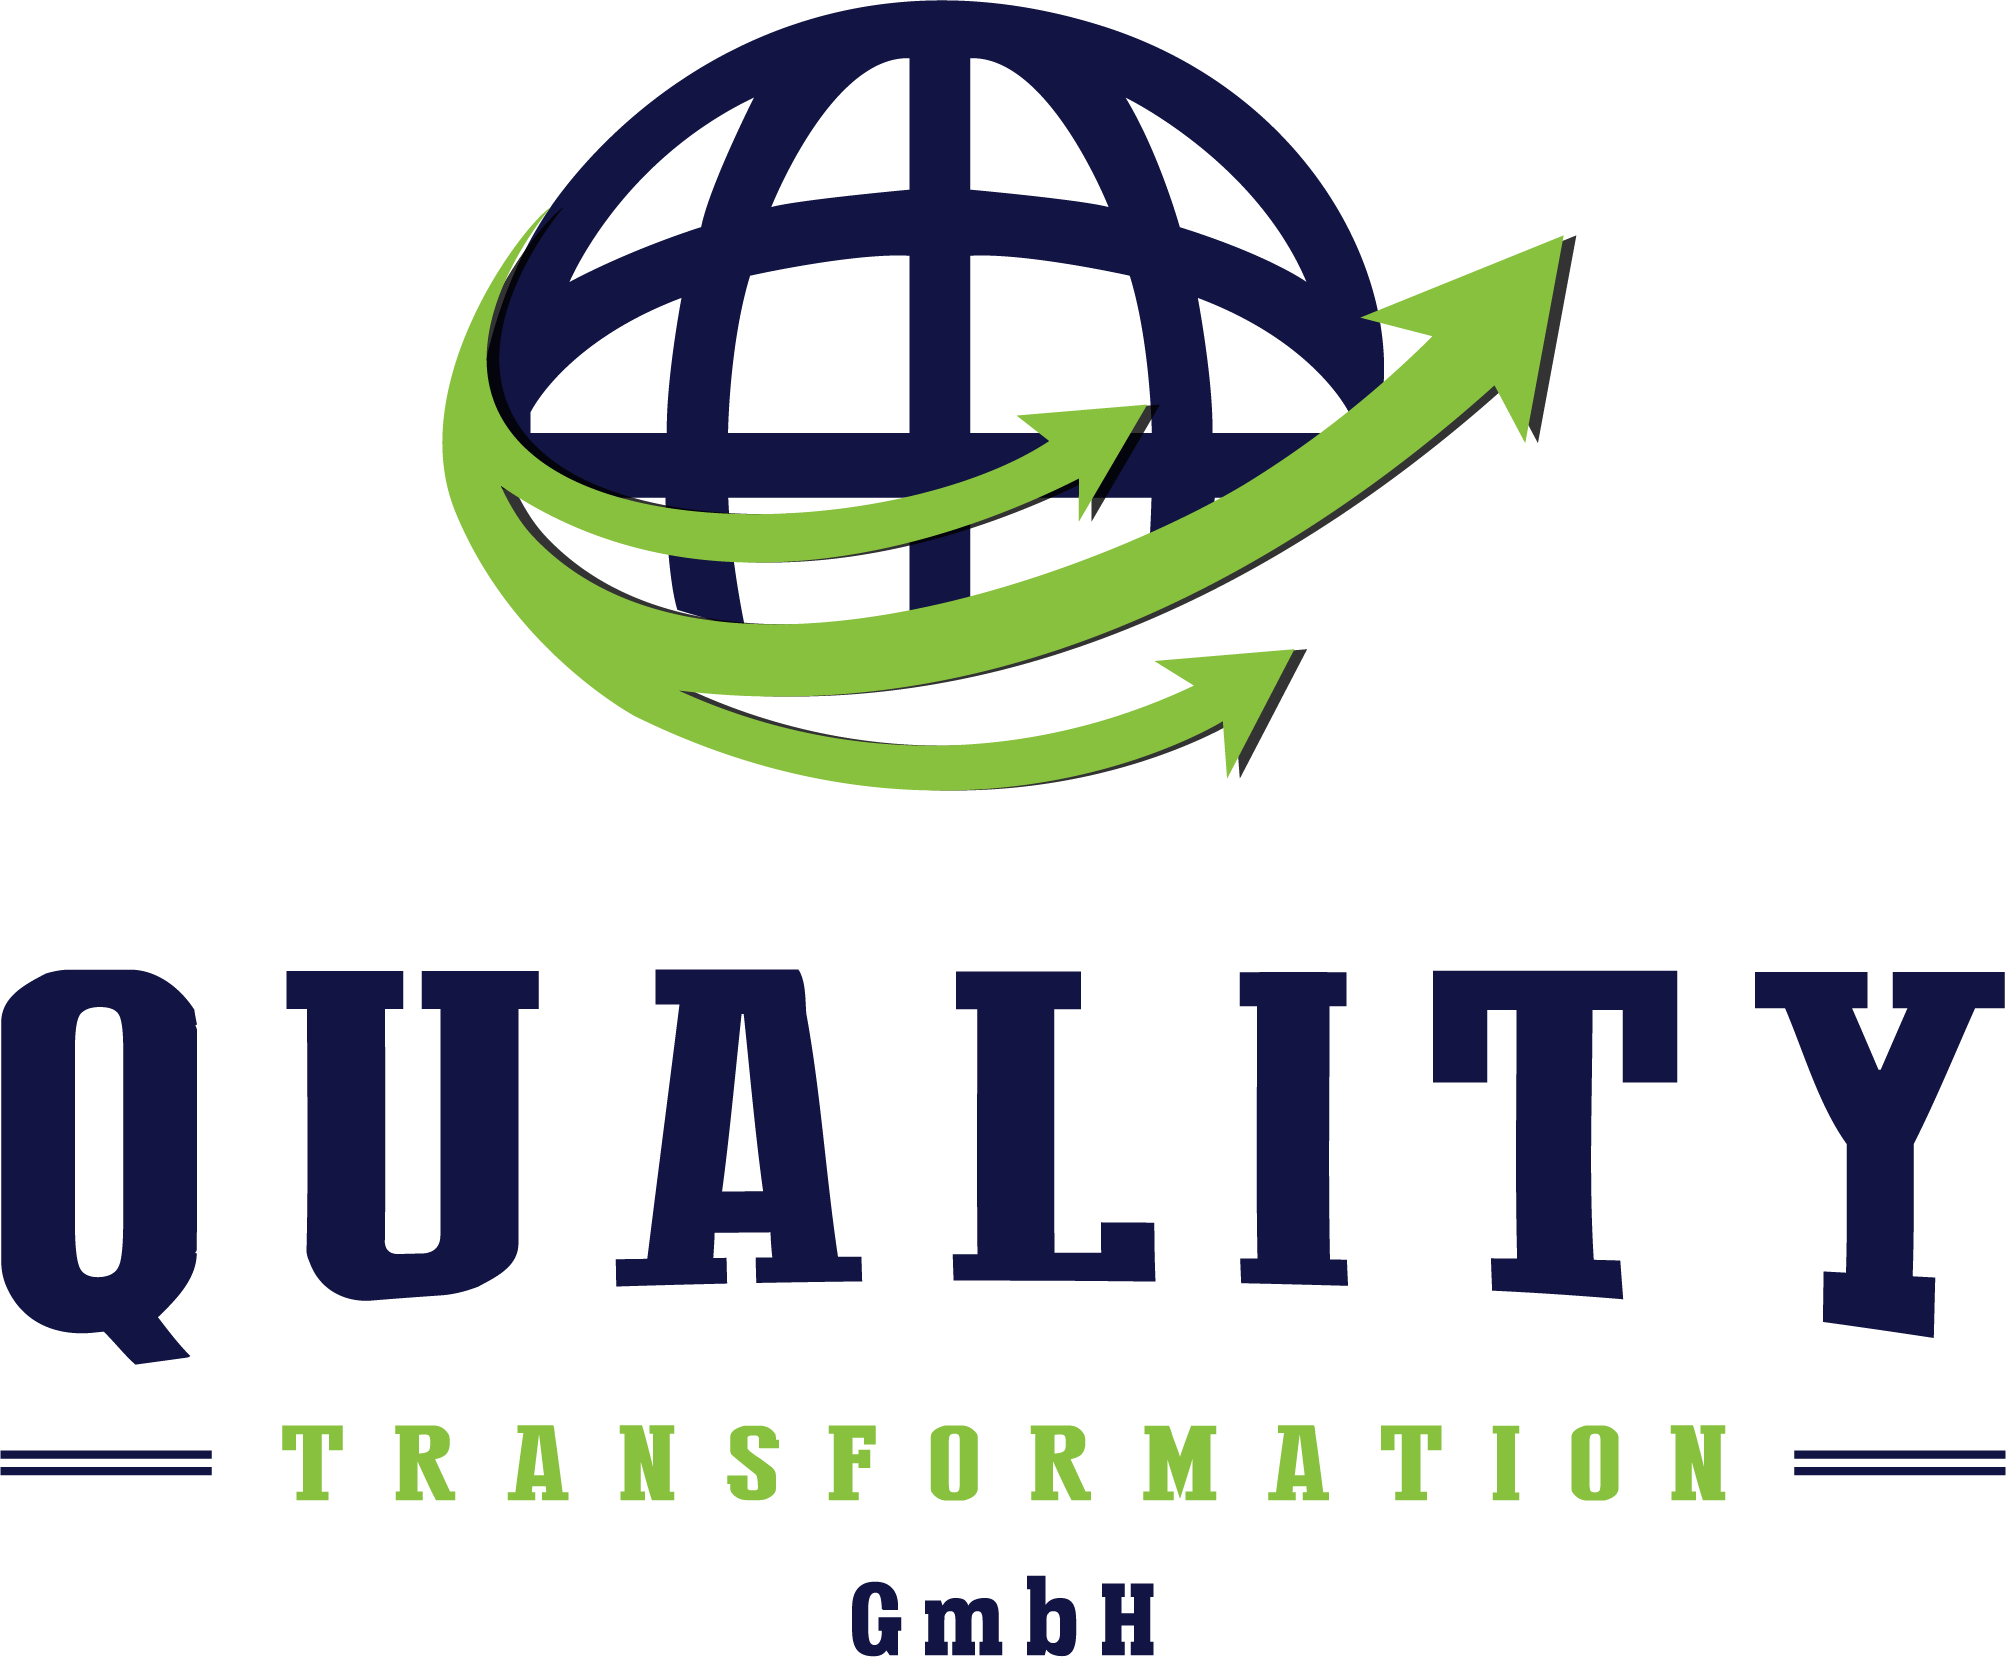 Quality Transformation